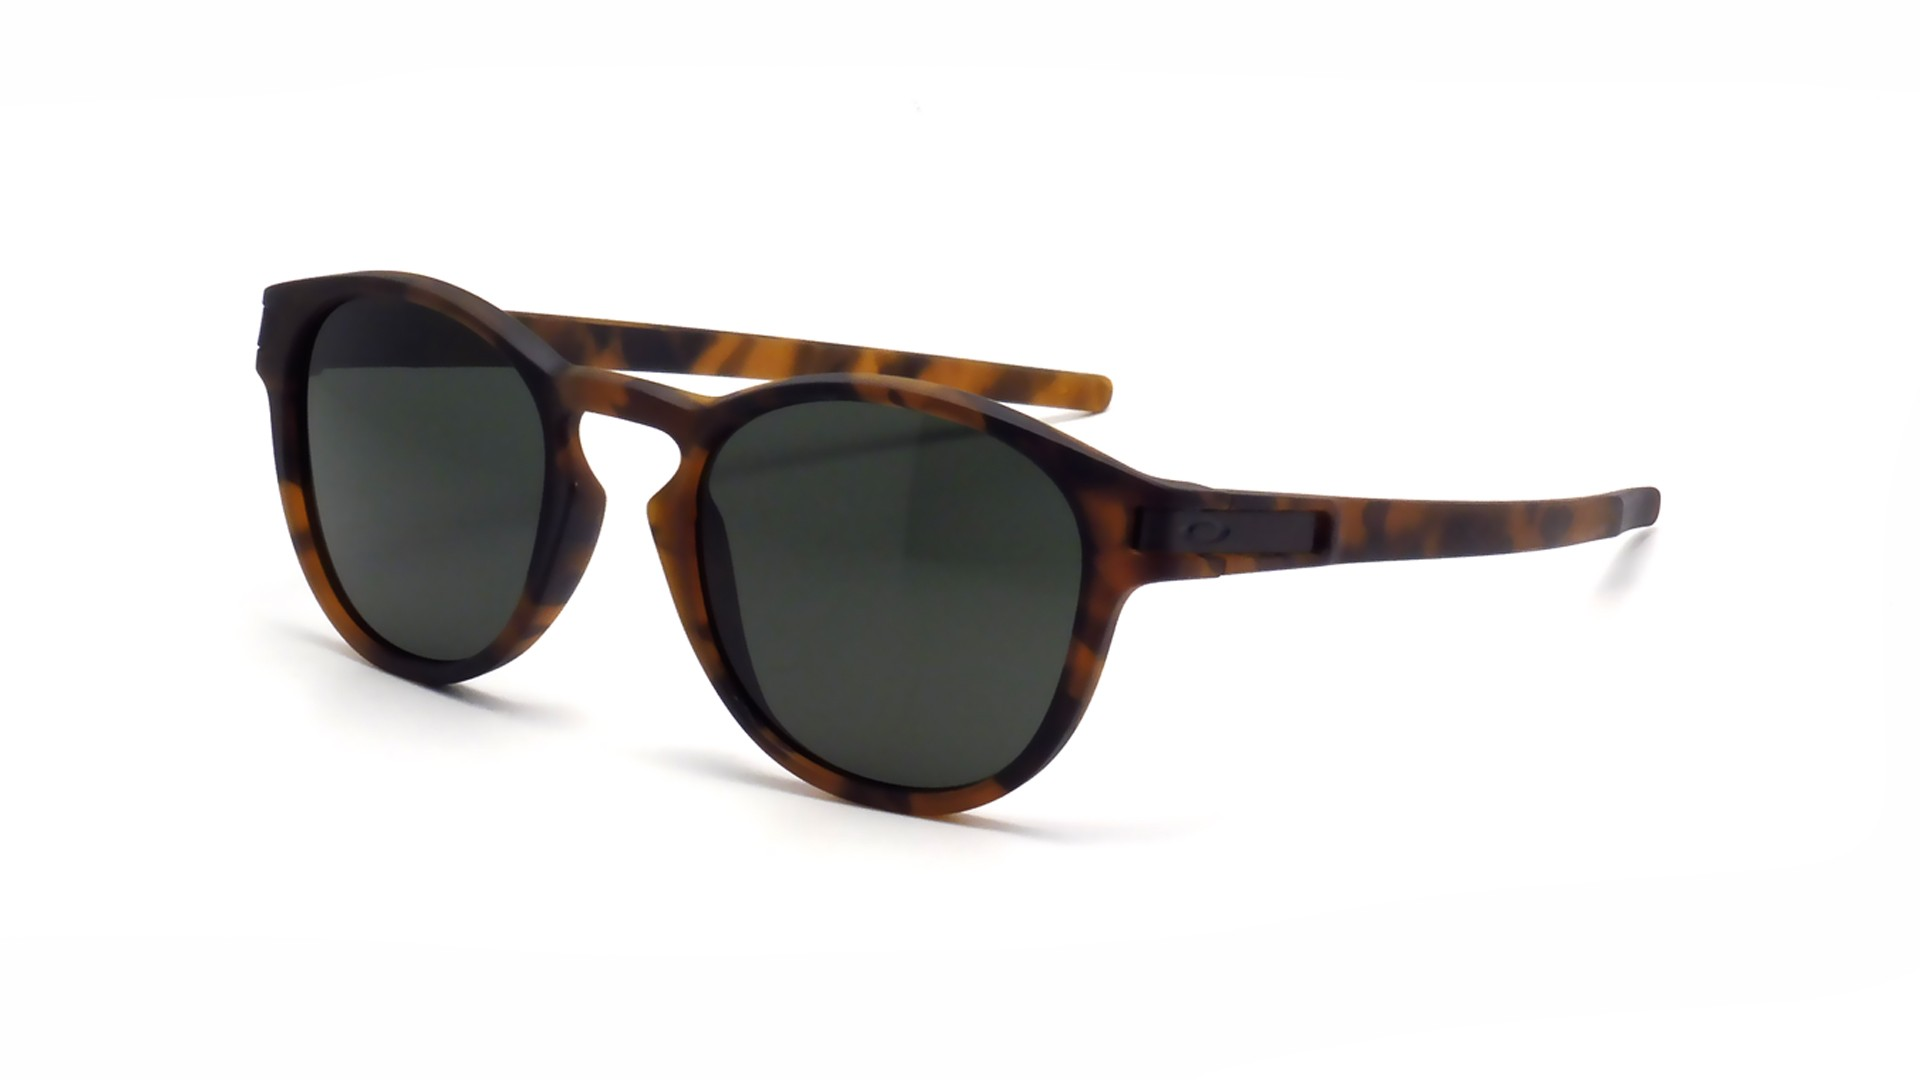 765cf89e87 Sunglasses Oakley Latch Tortoise OO9265 02 53-21 Medium